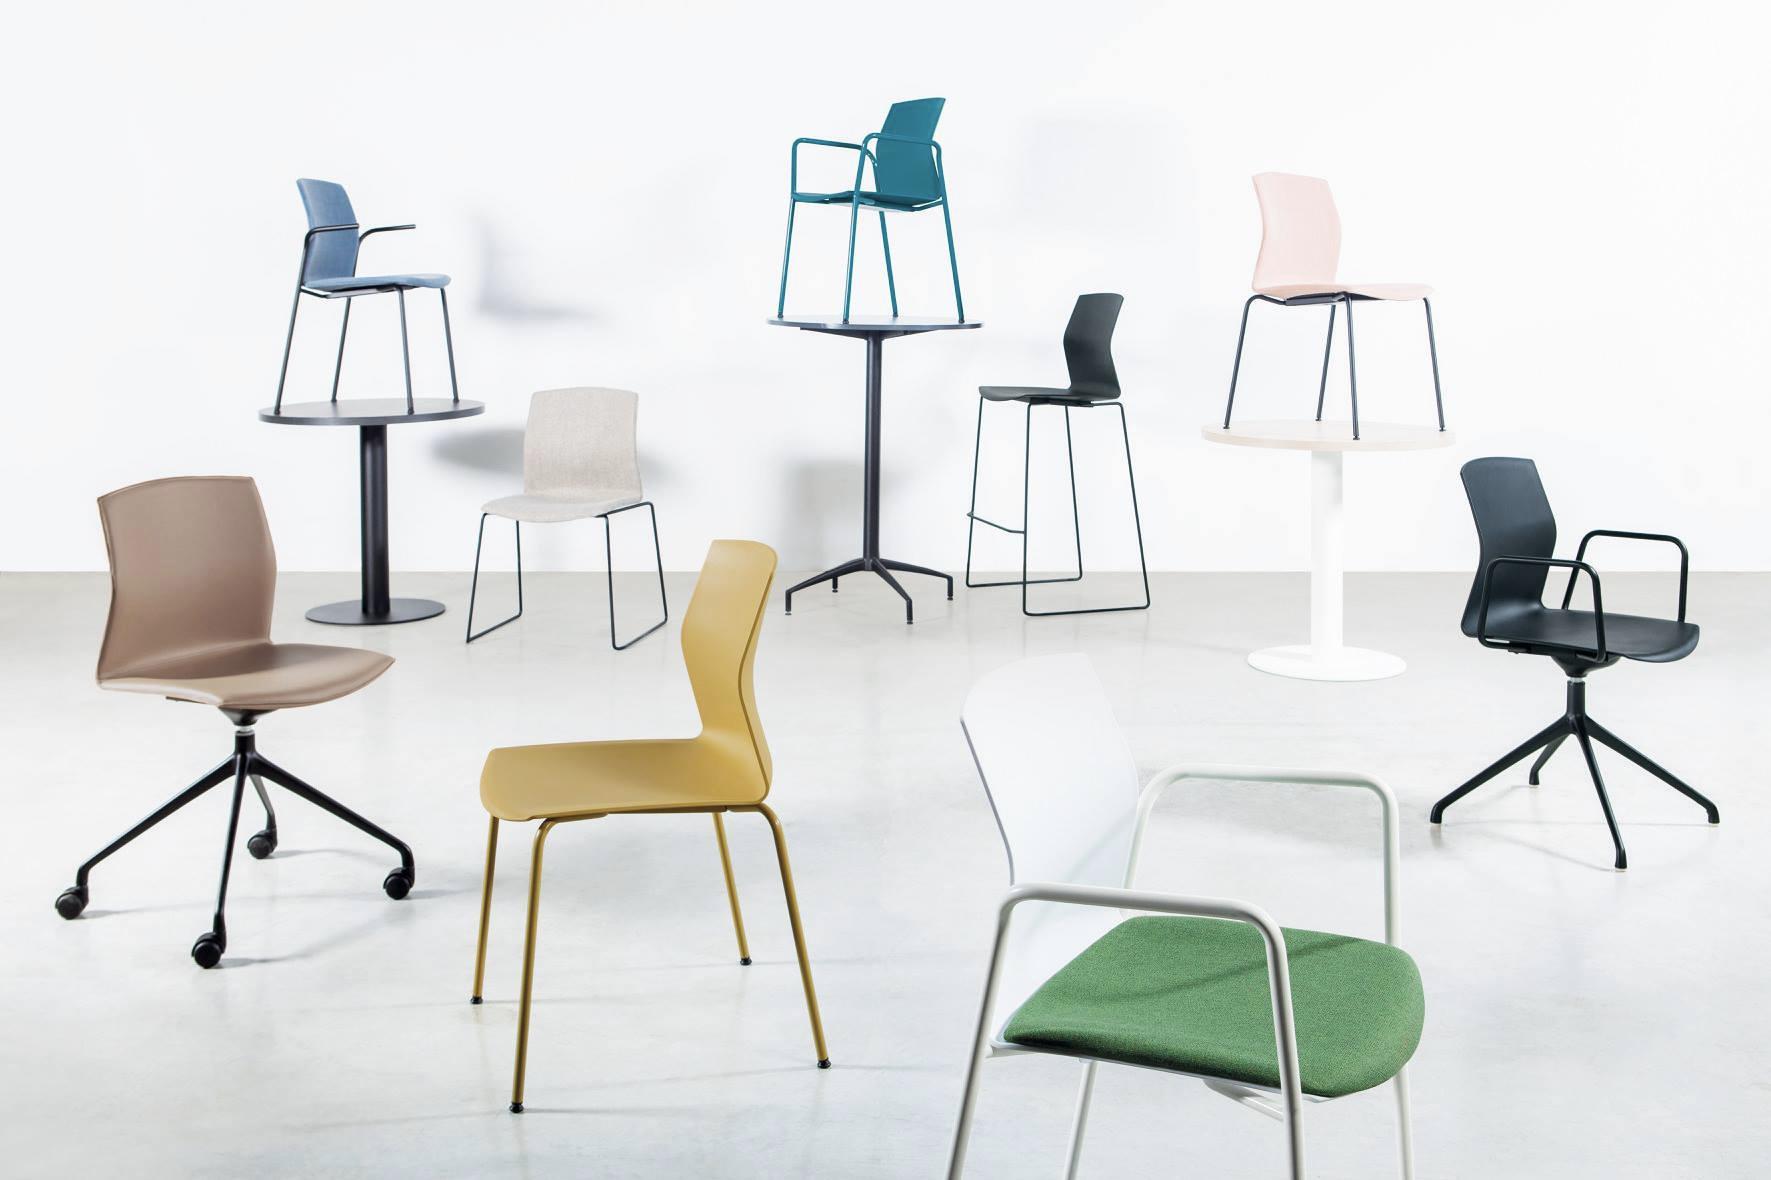 Kabi chairs